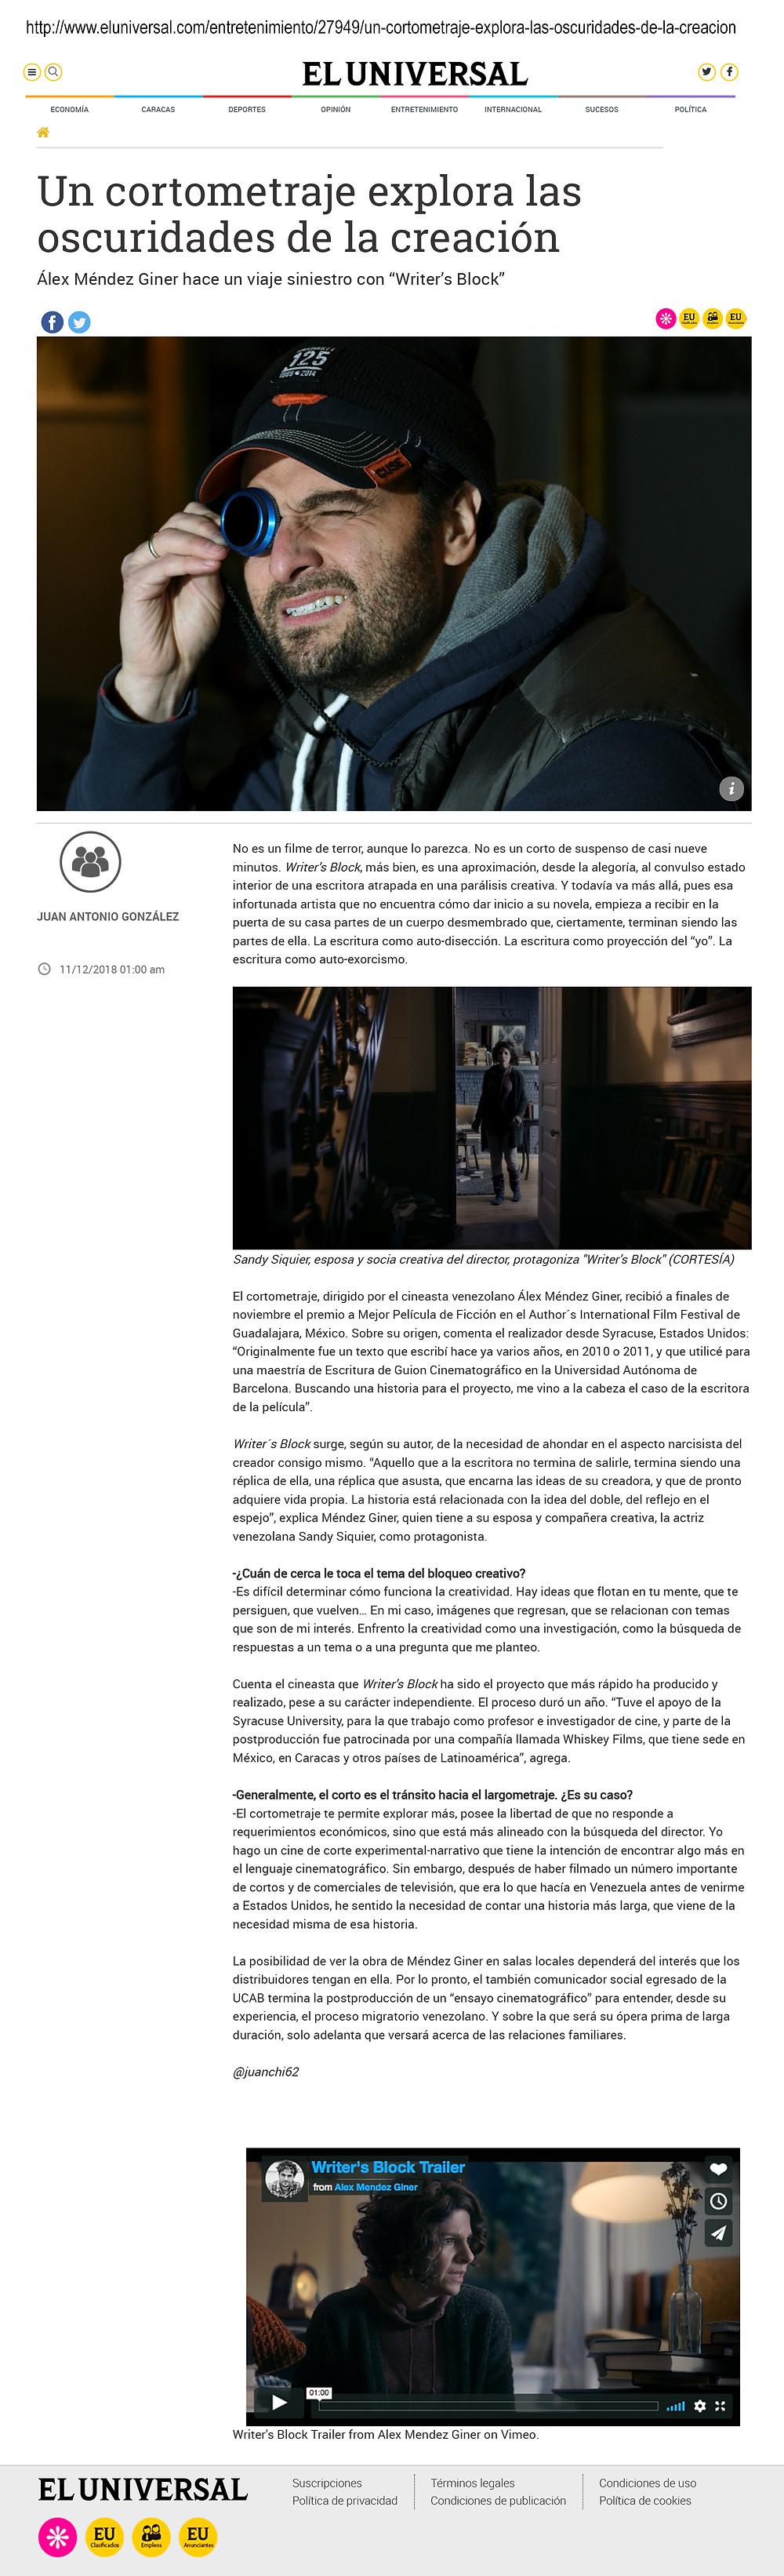 Writer's Block Featured in El Universal